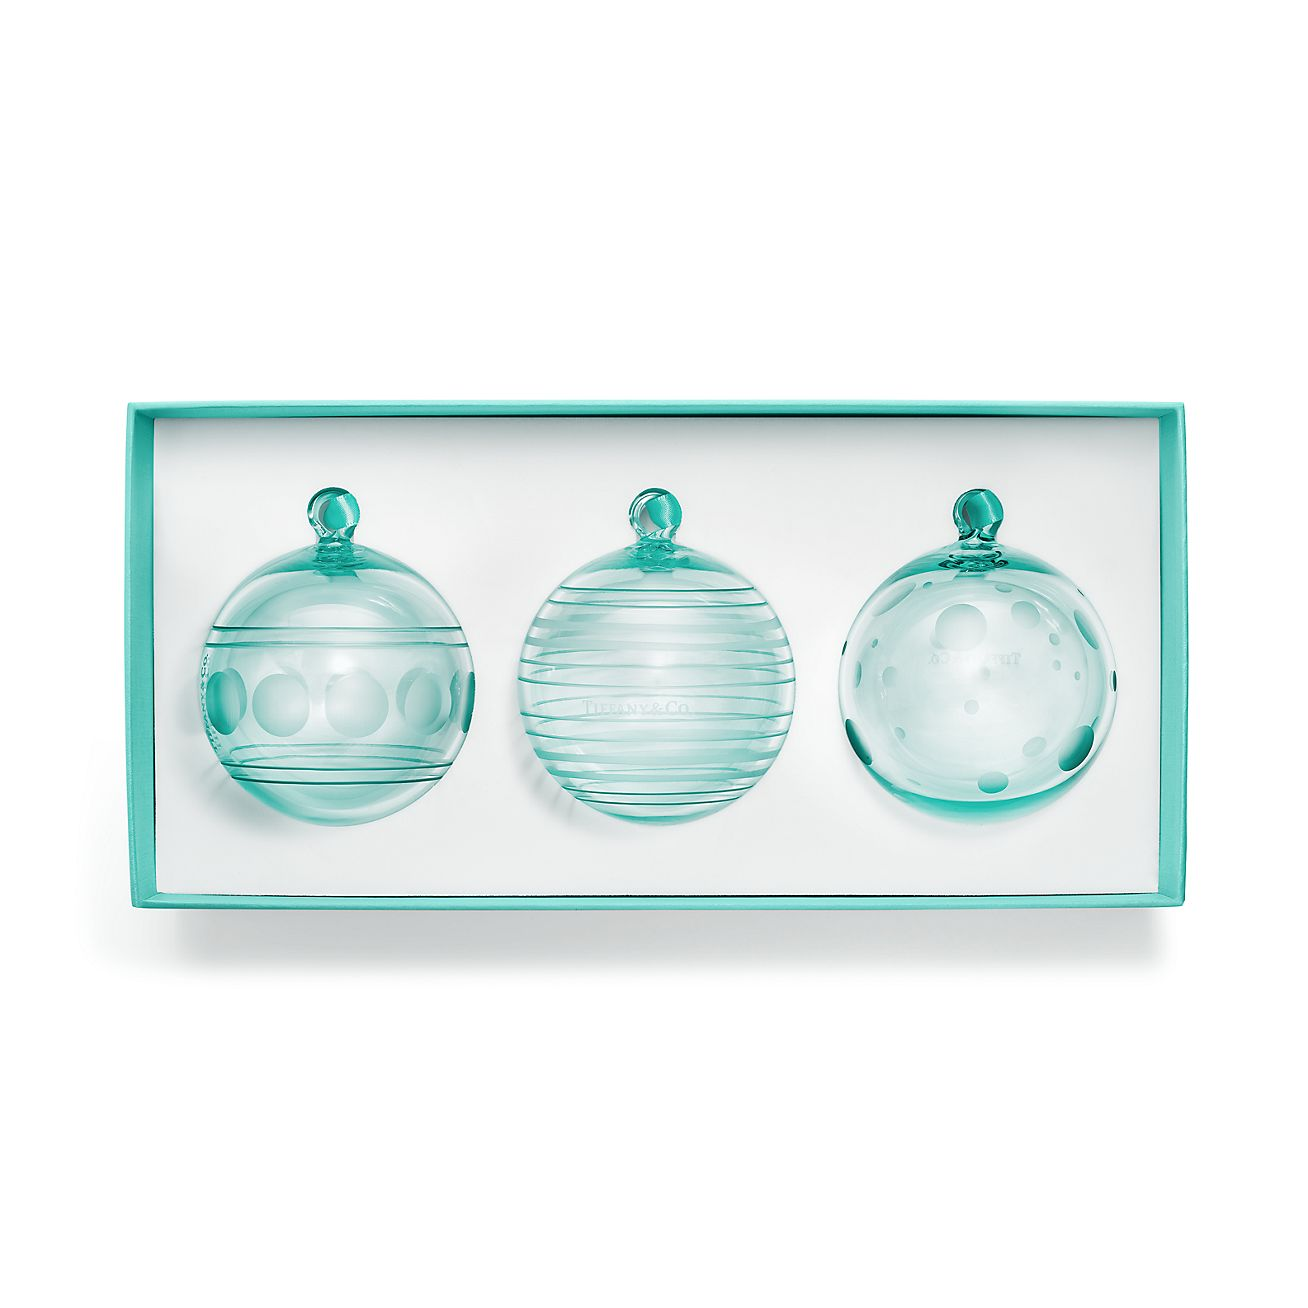 Ball Ornaments In Tiffany Blue Crystal Glass Set Of Three Tiffany Co